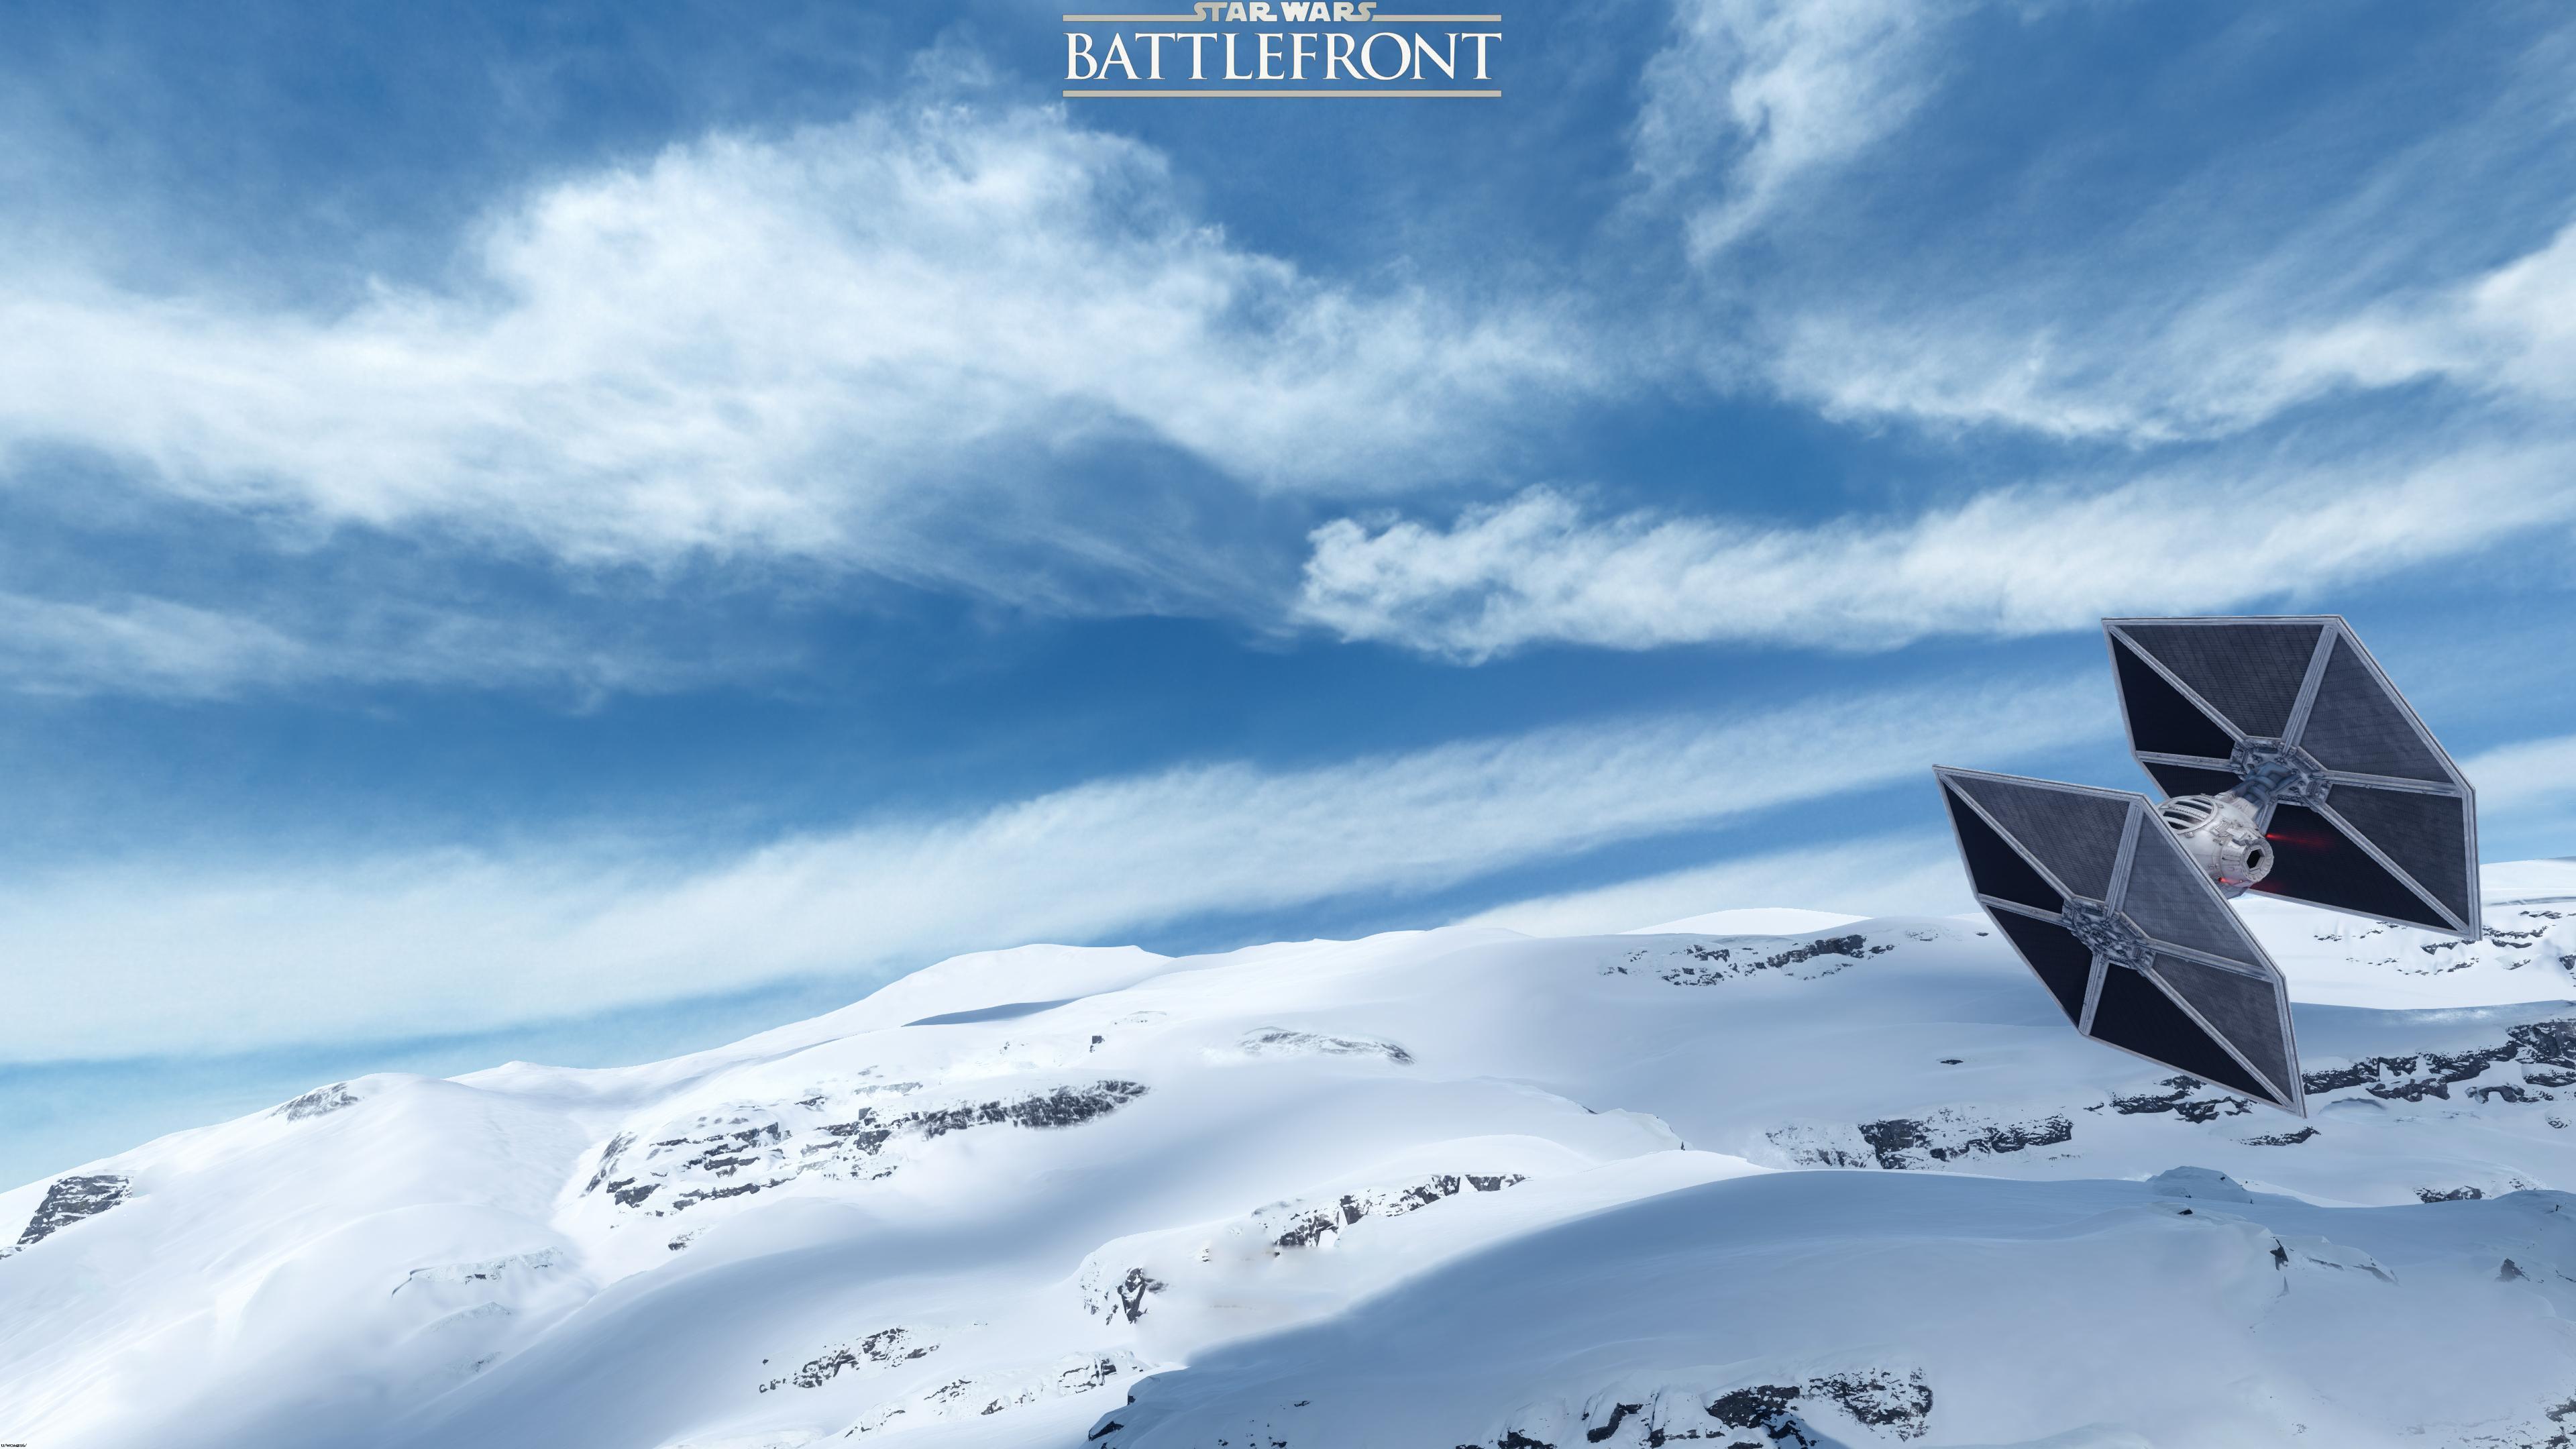 X Wing Fighter Iphone Wallpaper Star Wars Battlefront Fonds D 233 Cran Arri 232 Res Plan